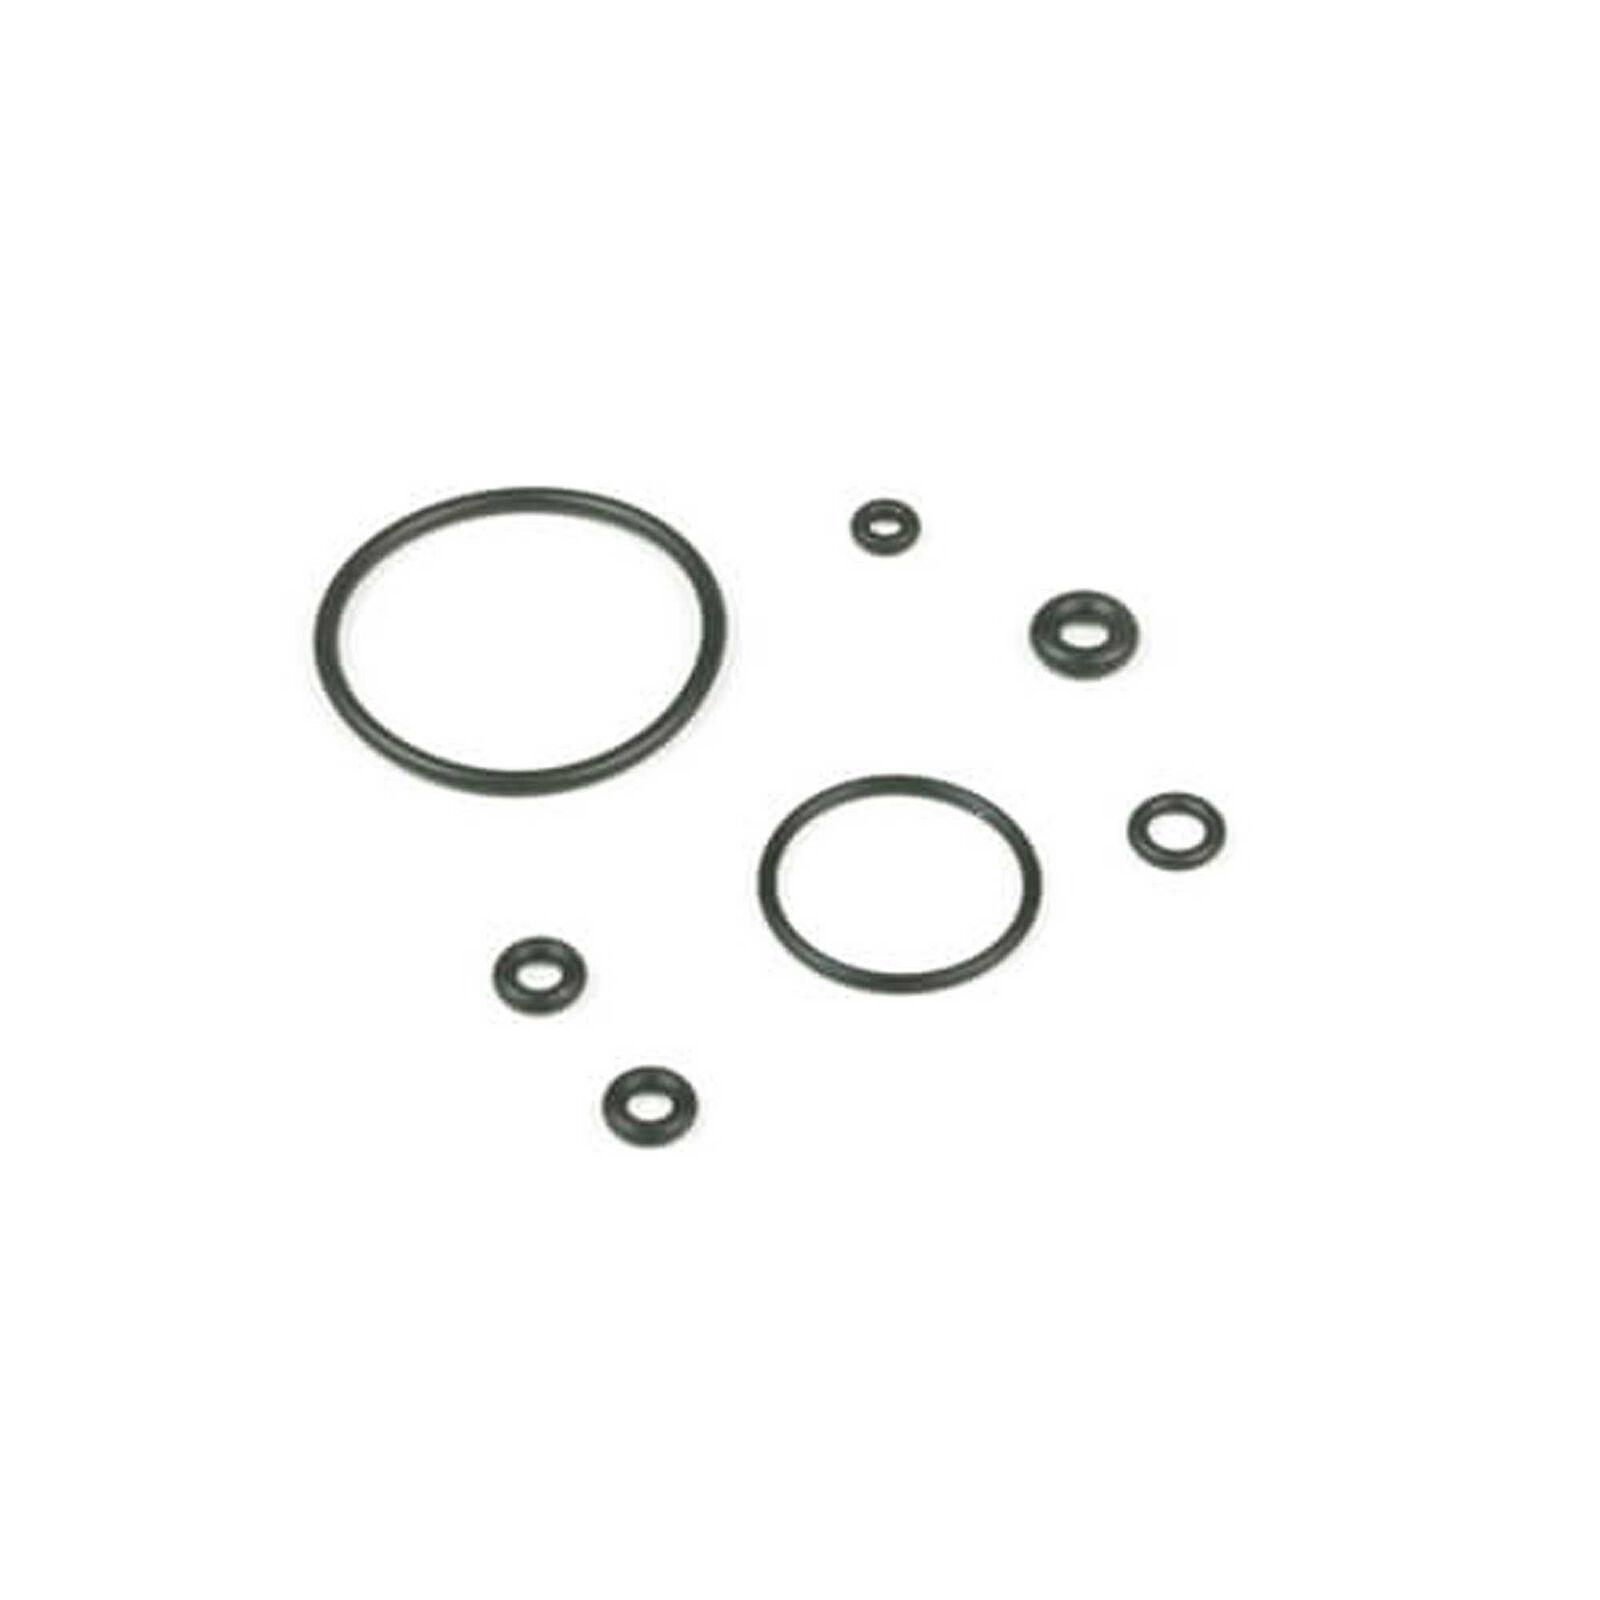 Engine O-Ring Set: 21aM aP bM